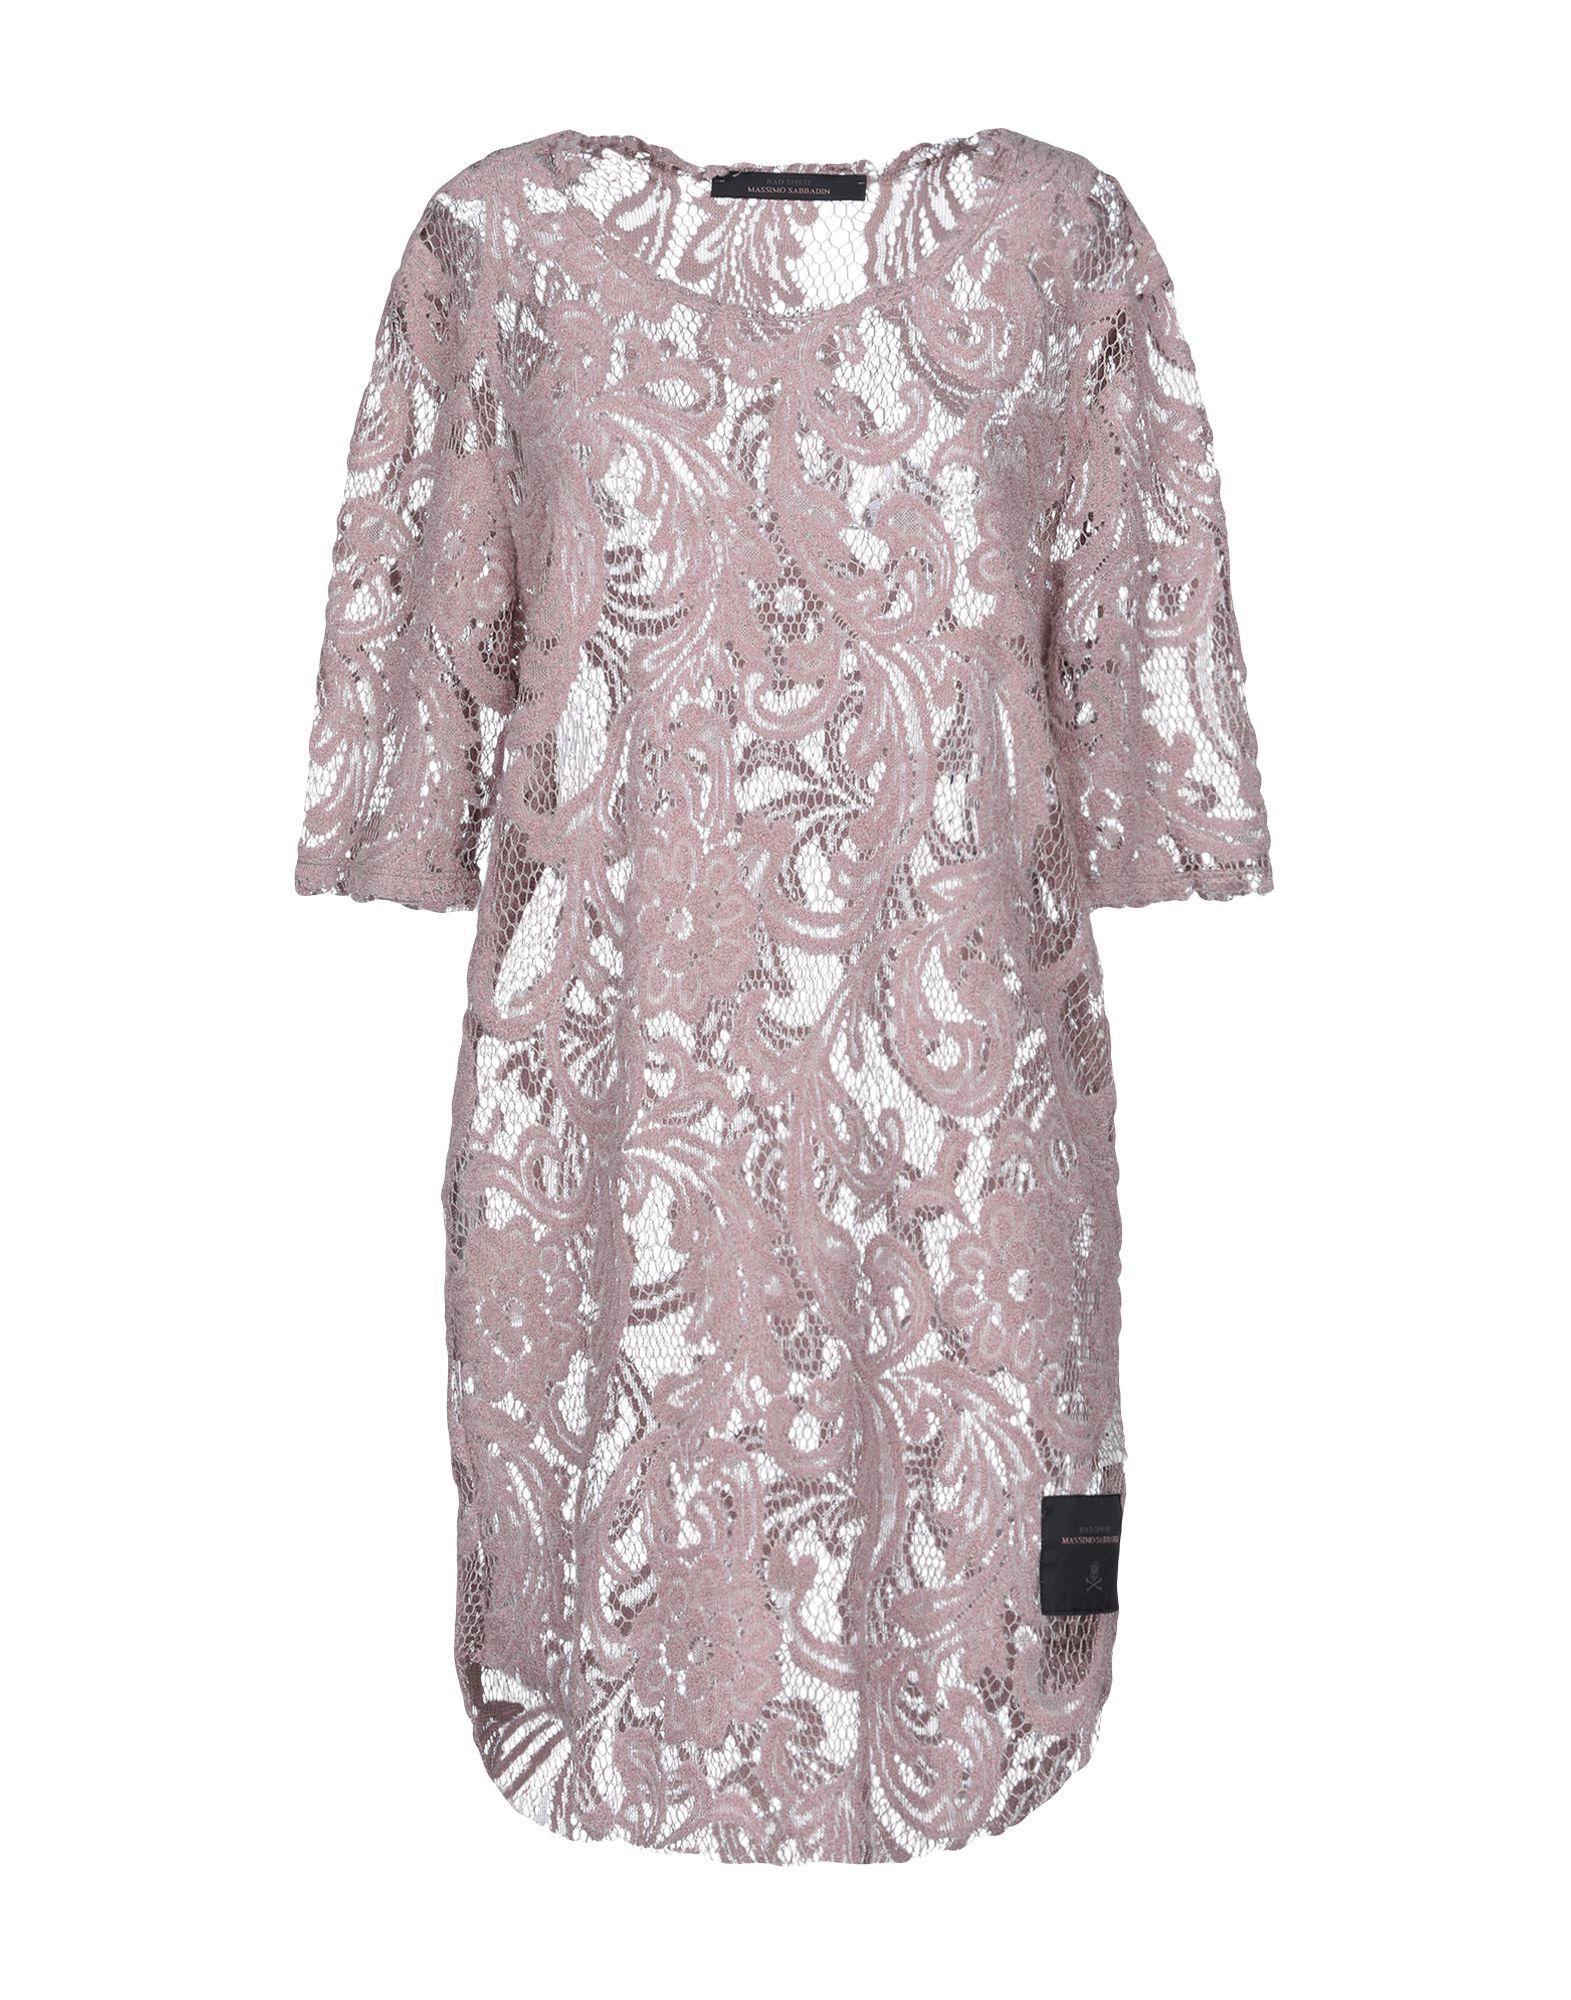 Bad Spirit Pastel Pink Cotton Lace Short Sleeve Dress